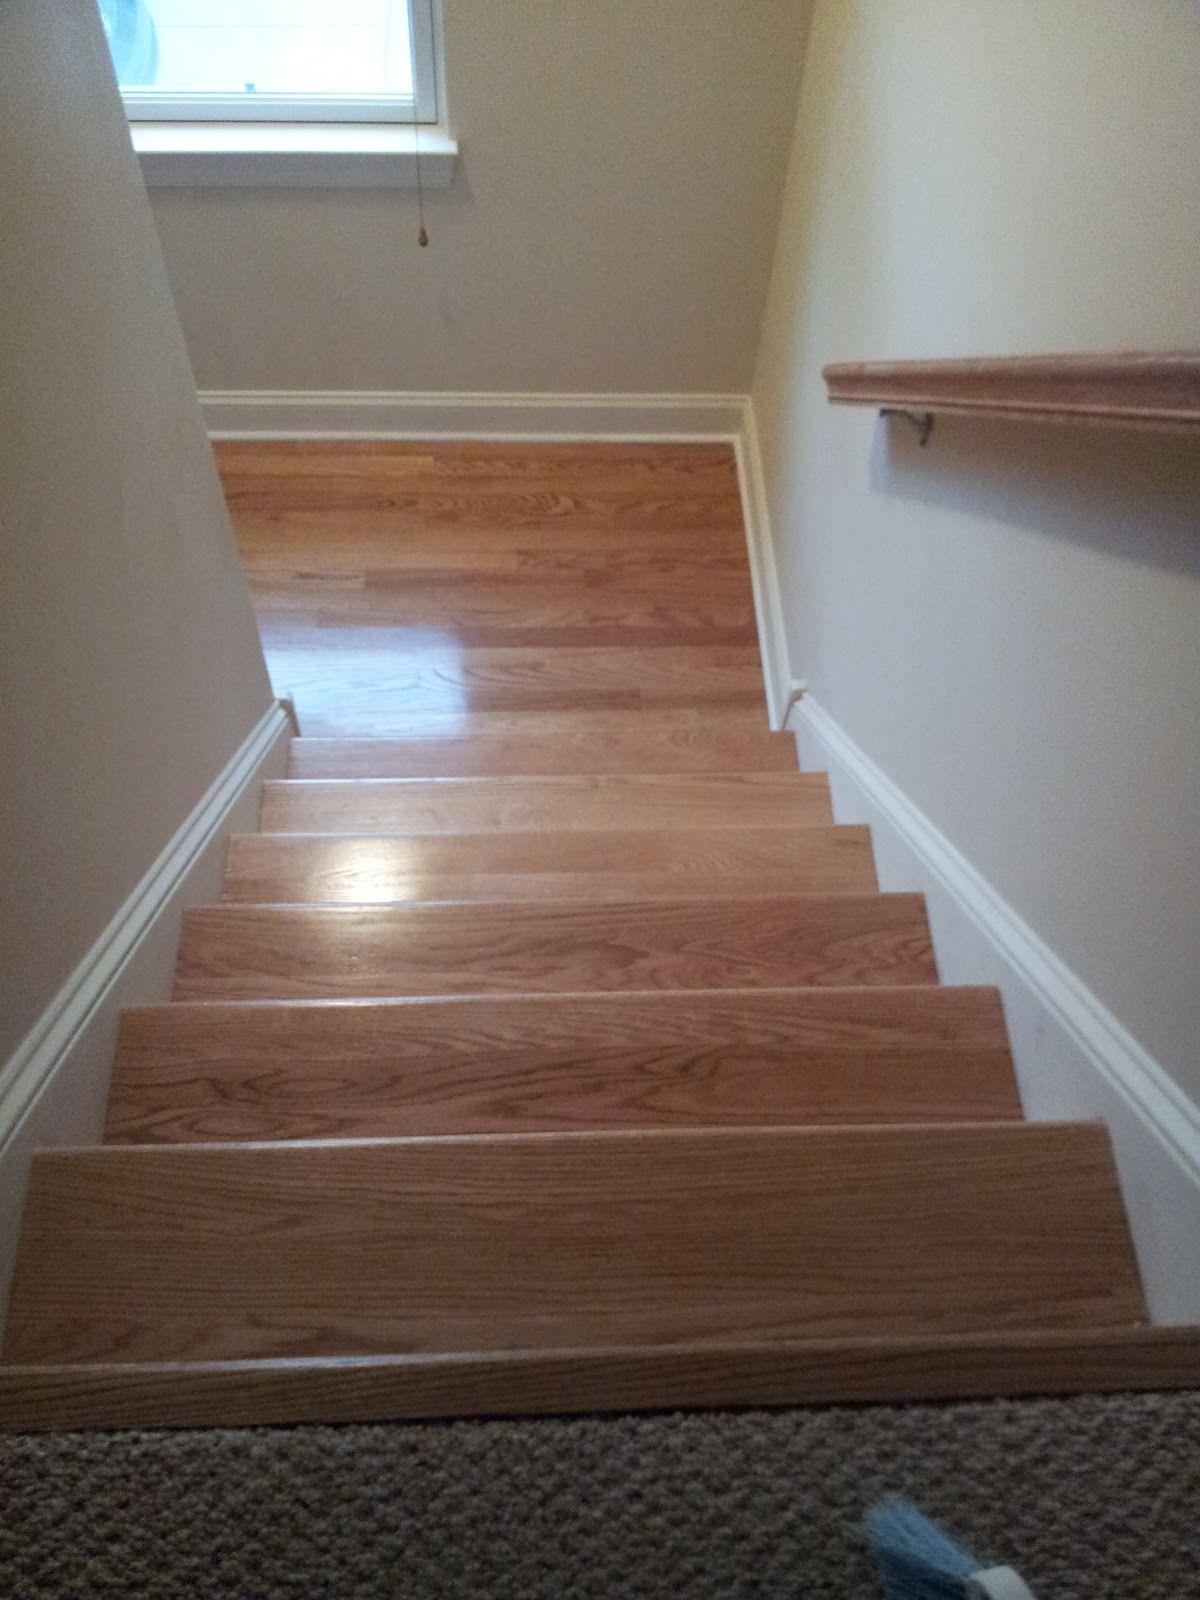 Red Oak Hardwood Stair Refinishing Red Oak Hardwood Hardwood   Wooden Stairs Carpet Landing   French Cap   Contemporary   Redo   Upstairs   Partially Carpeted